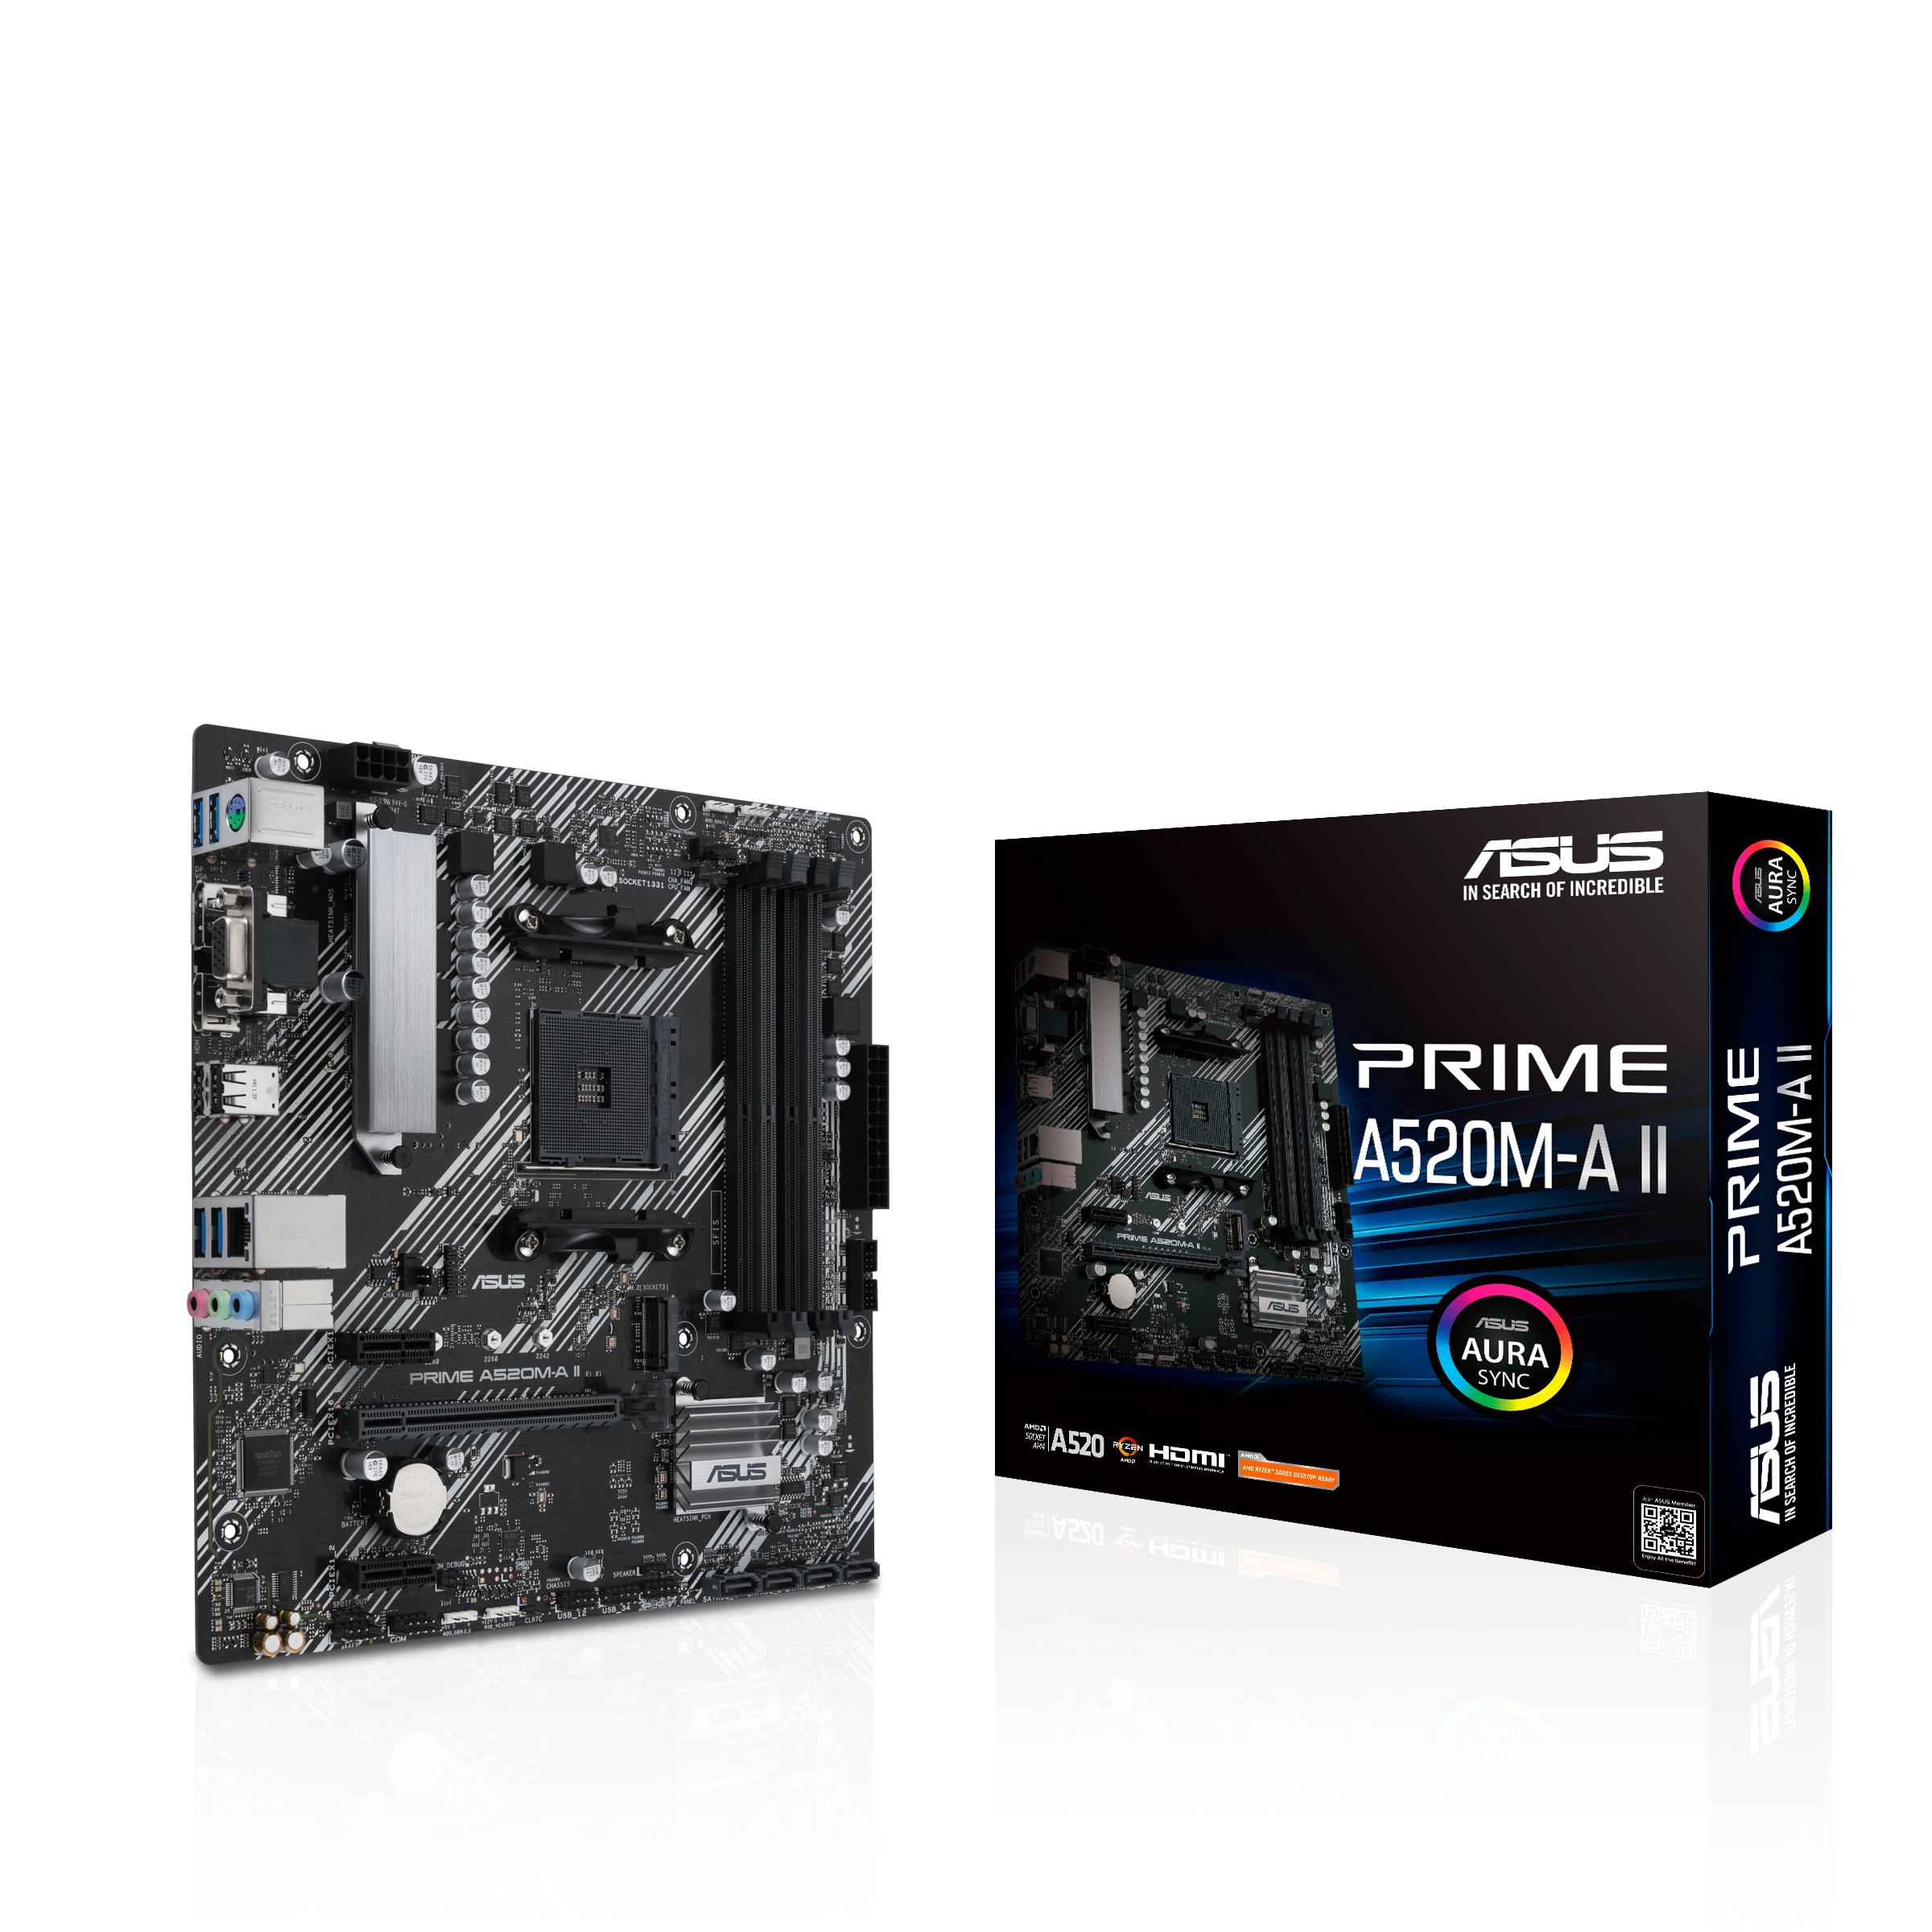 ASUS PRIME A520M-A II - Motherboard - micro ATX - Socket AM4 - AMD A520 - USB 3.2 Gen 1 - Gigabit LAN - Onboard-Grafik (CPU erforderlich)